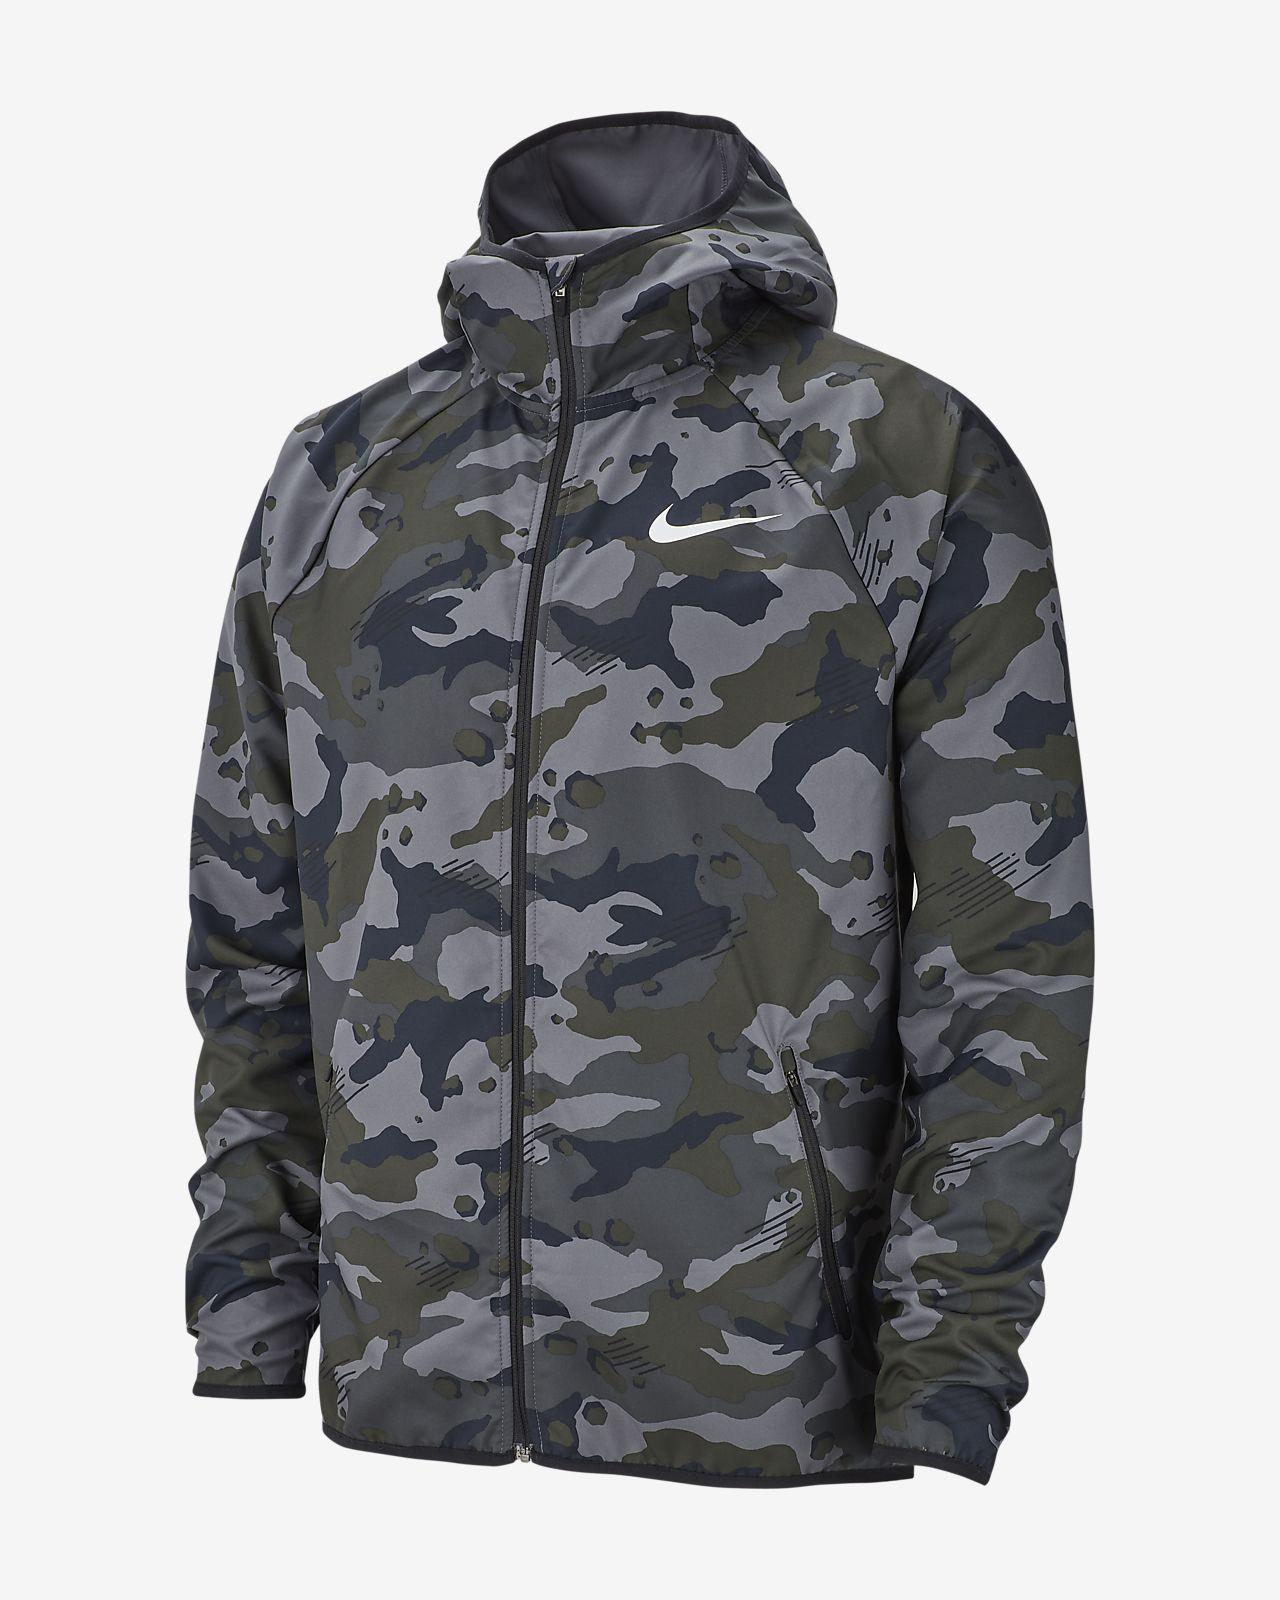 6aa41711591 Nike Dri-FIT Men s Woven Camo Training Jacket. Nike.com